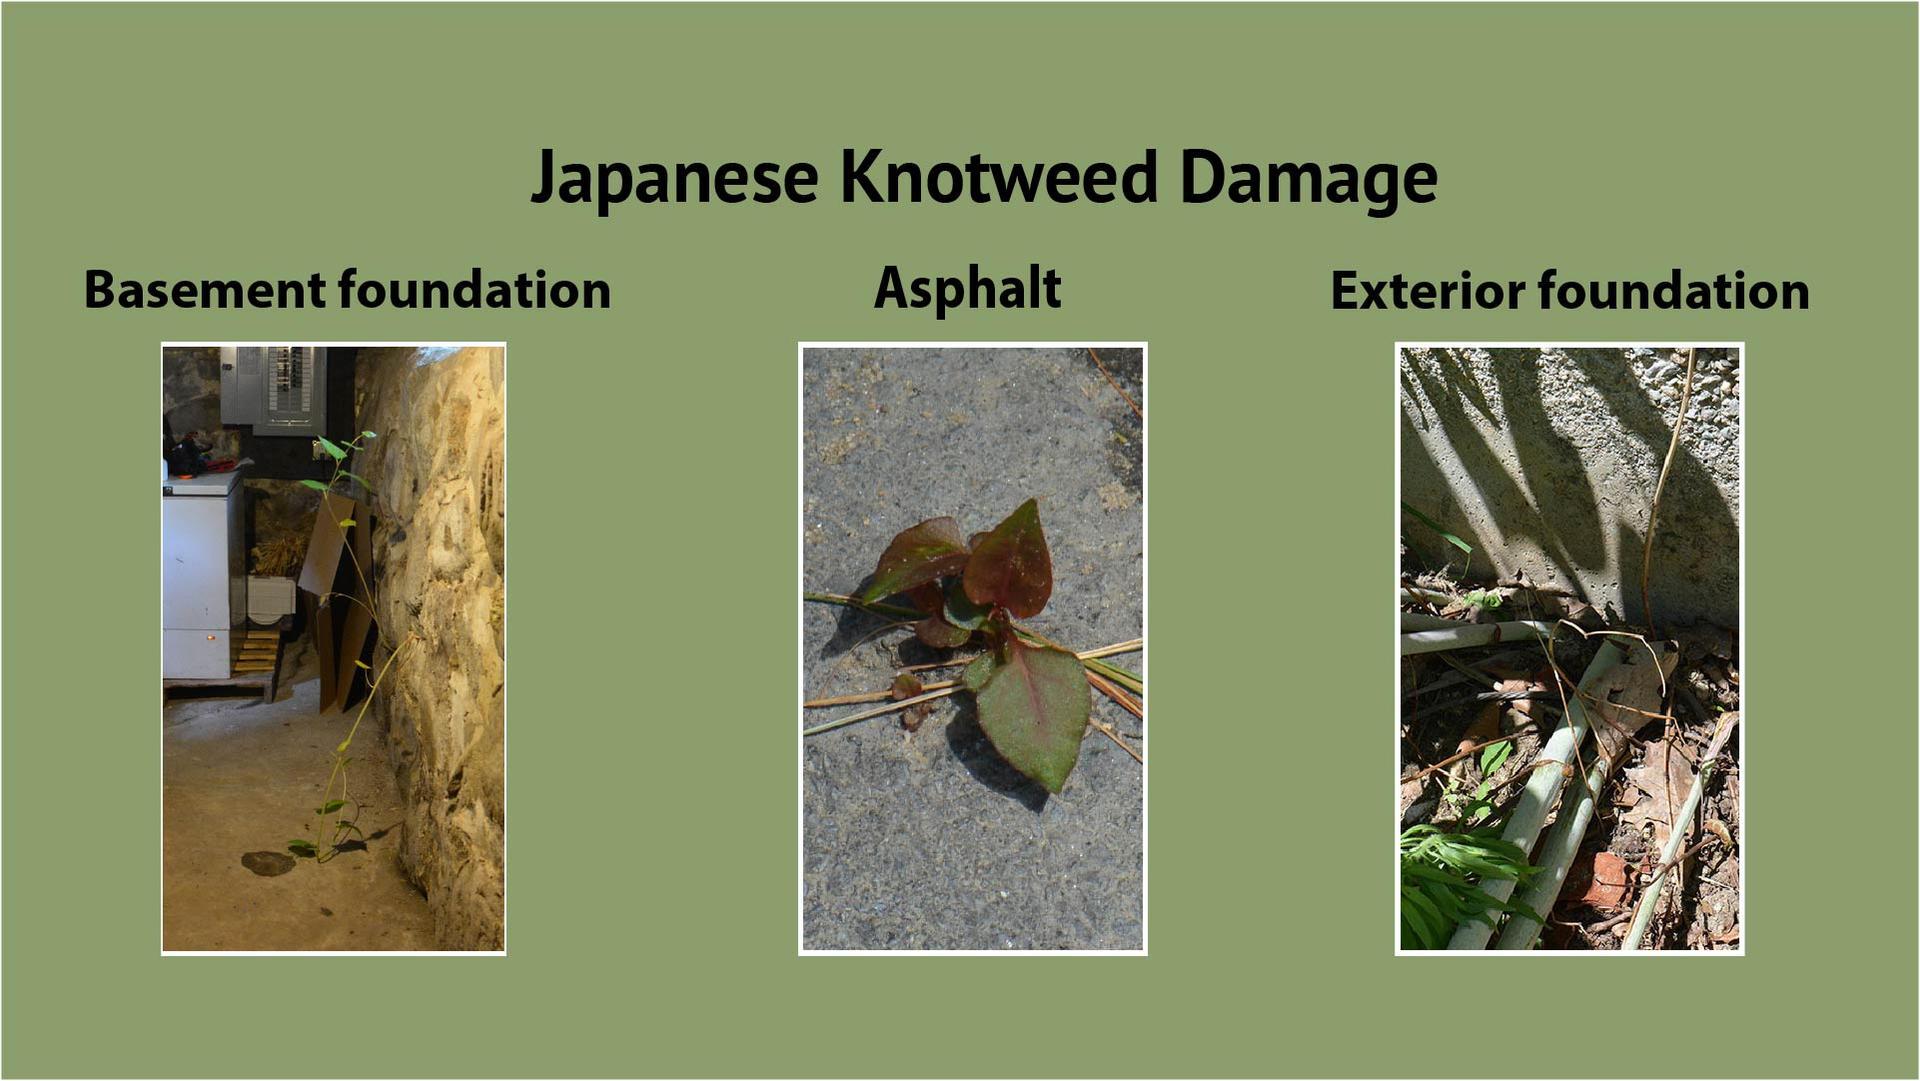 Japanese Knotweed Growth Habit